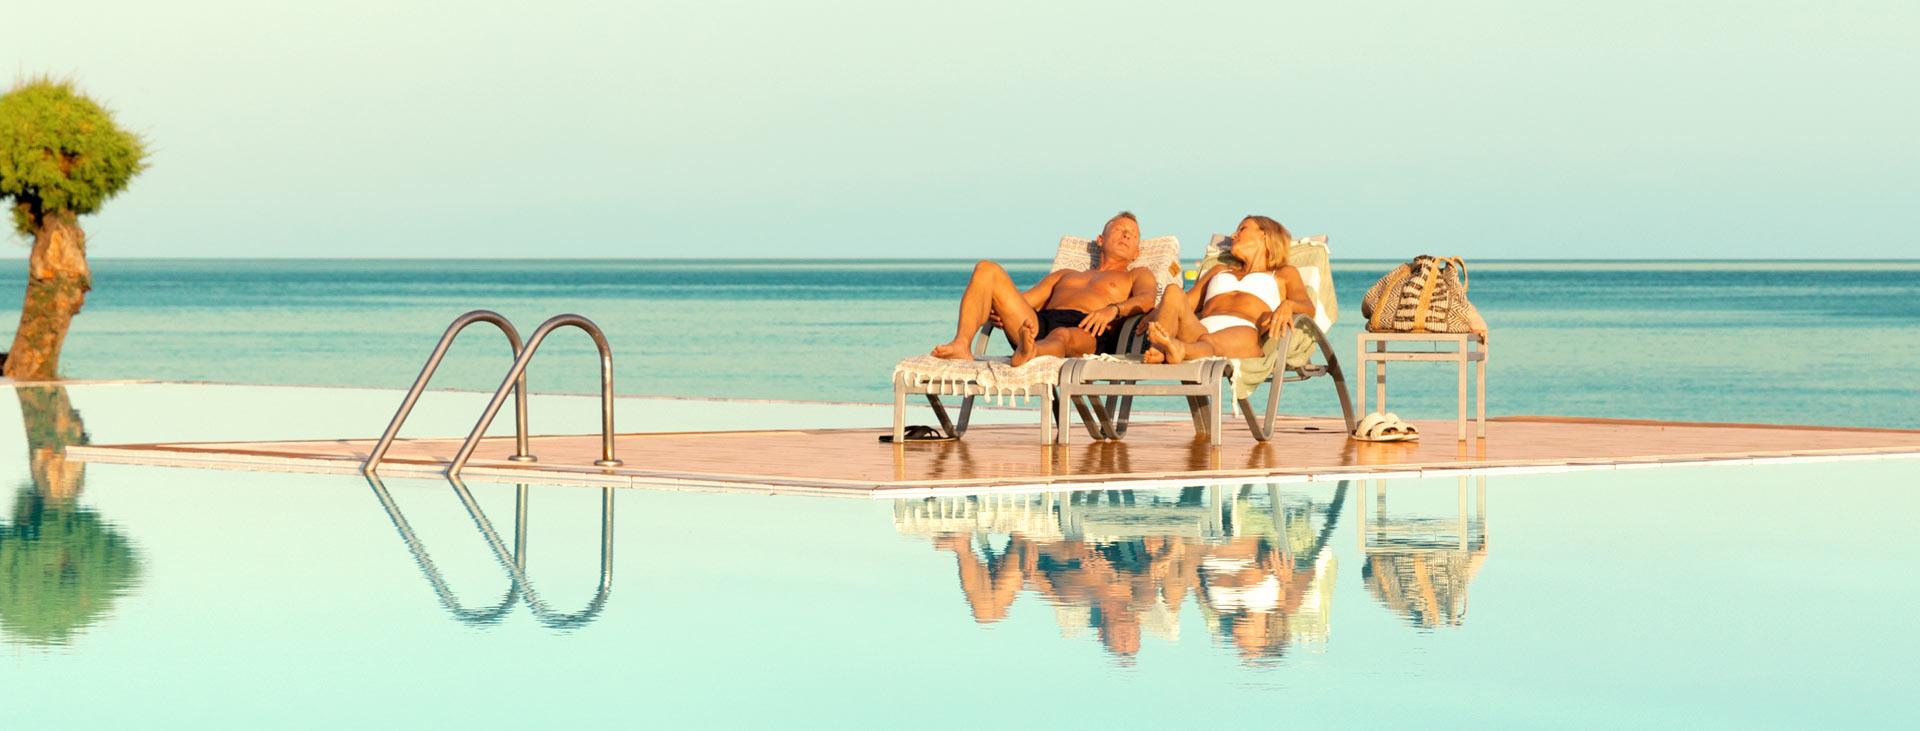 Sunprime Miramare Beach, Rhodos vestkyst, Rhodos, Grækenland